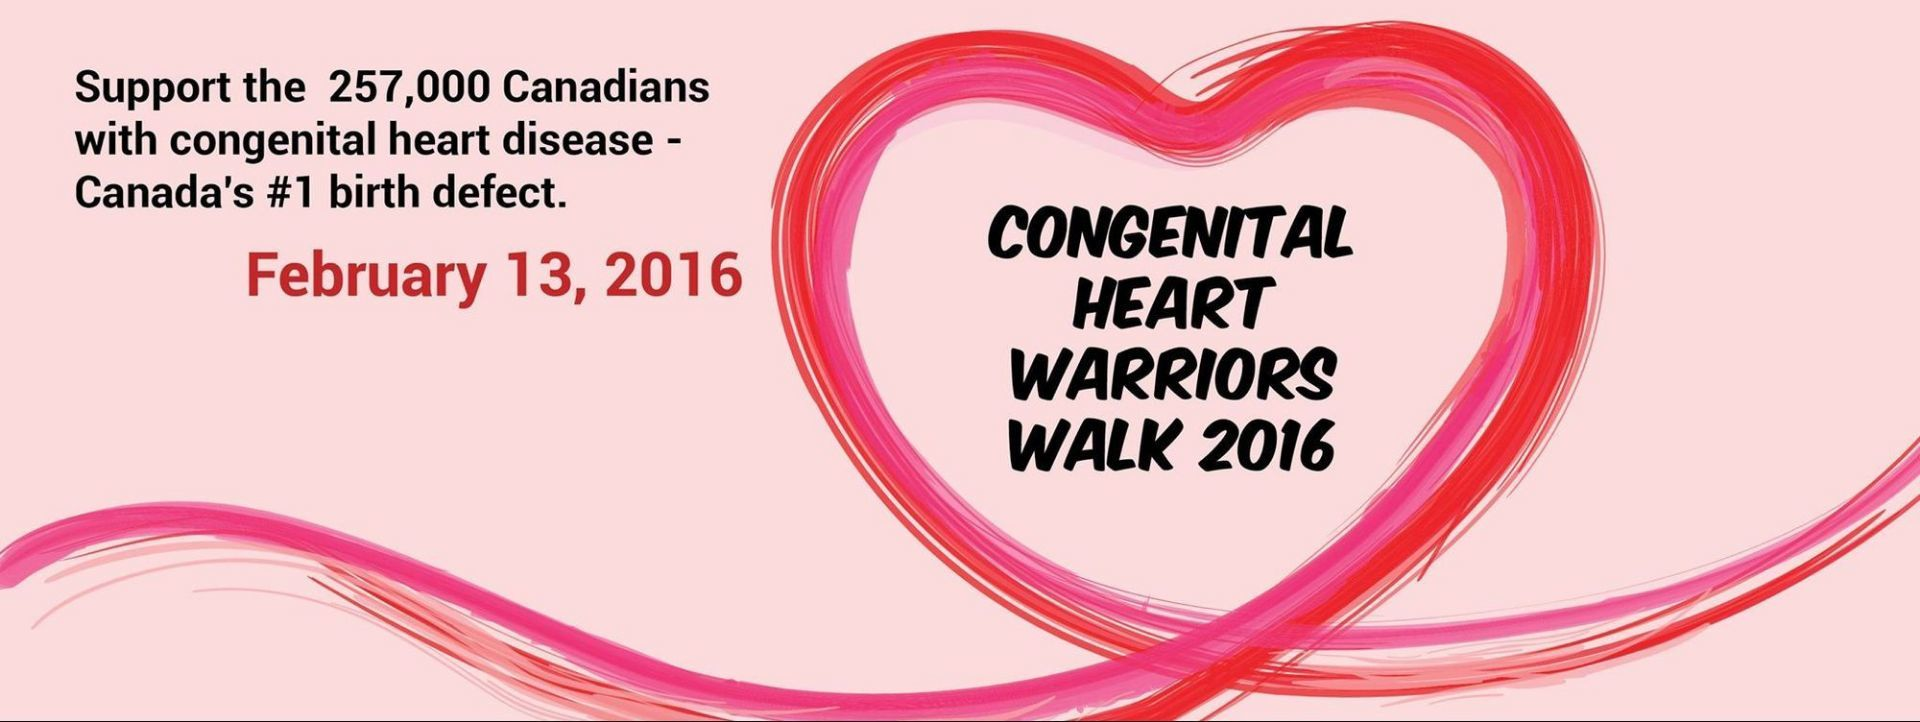 Congenital Heart Warriors Walk 2016